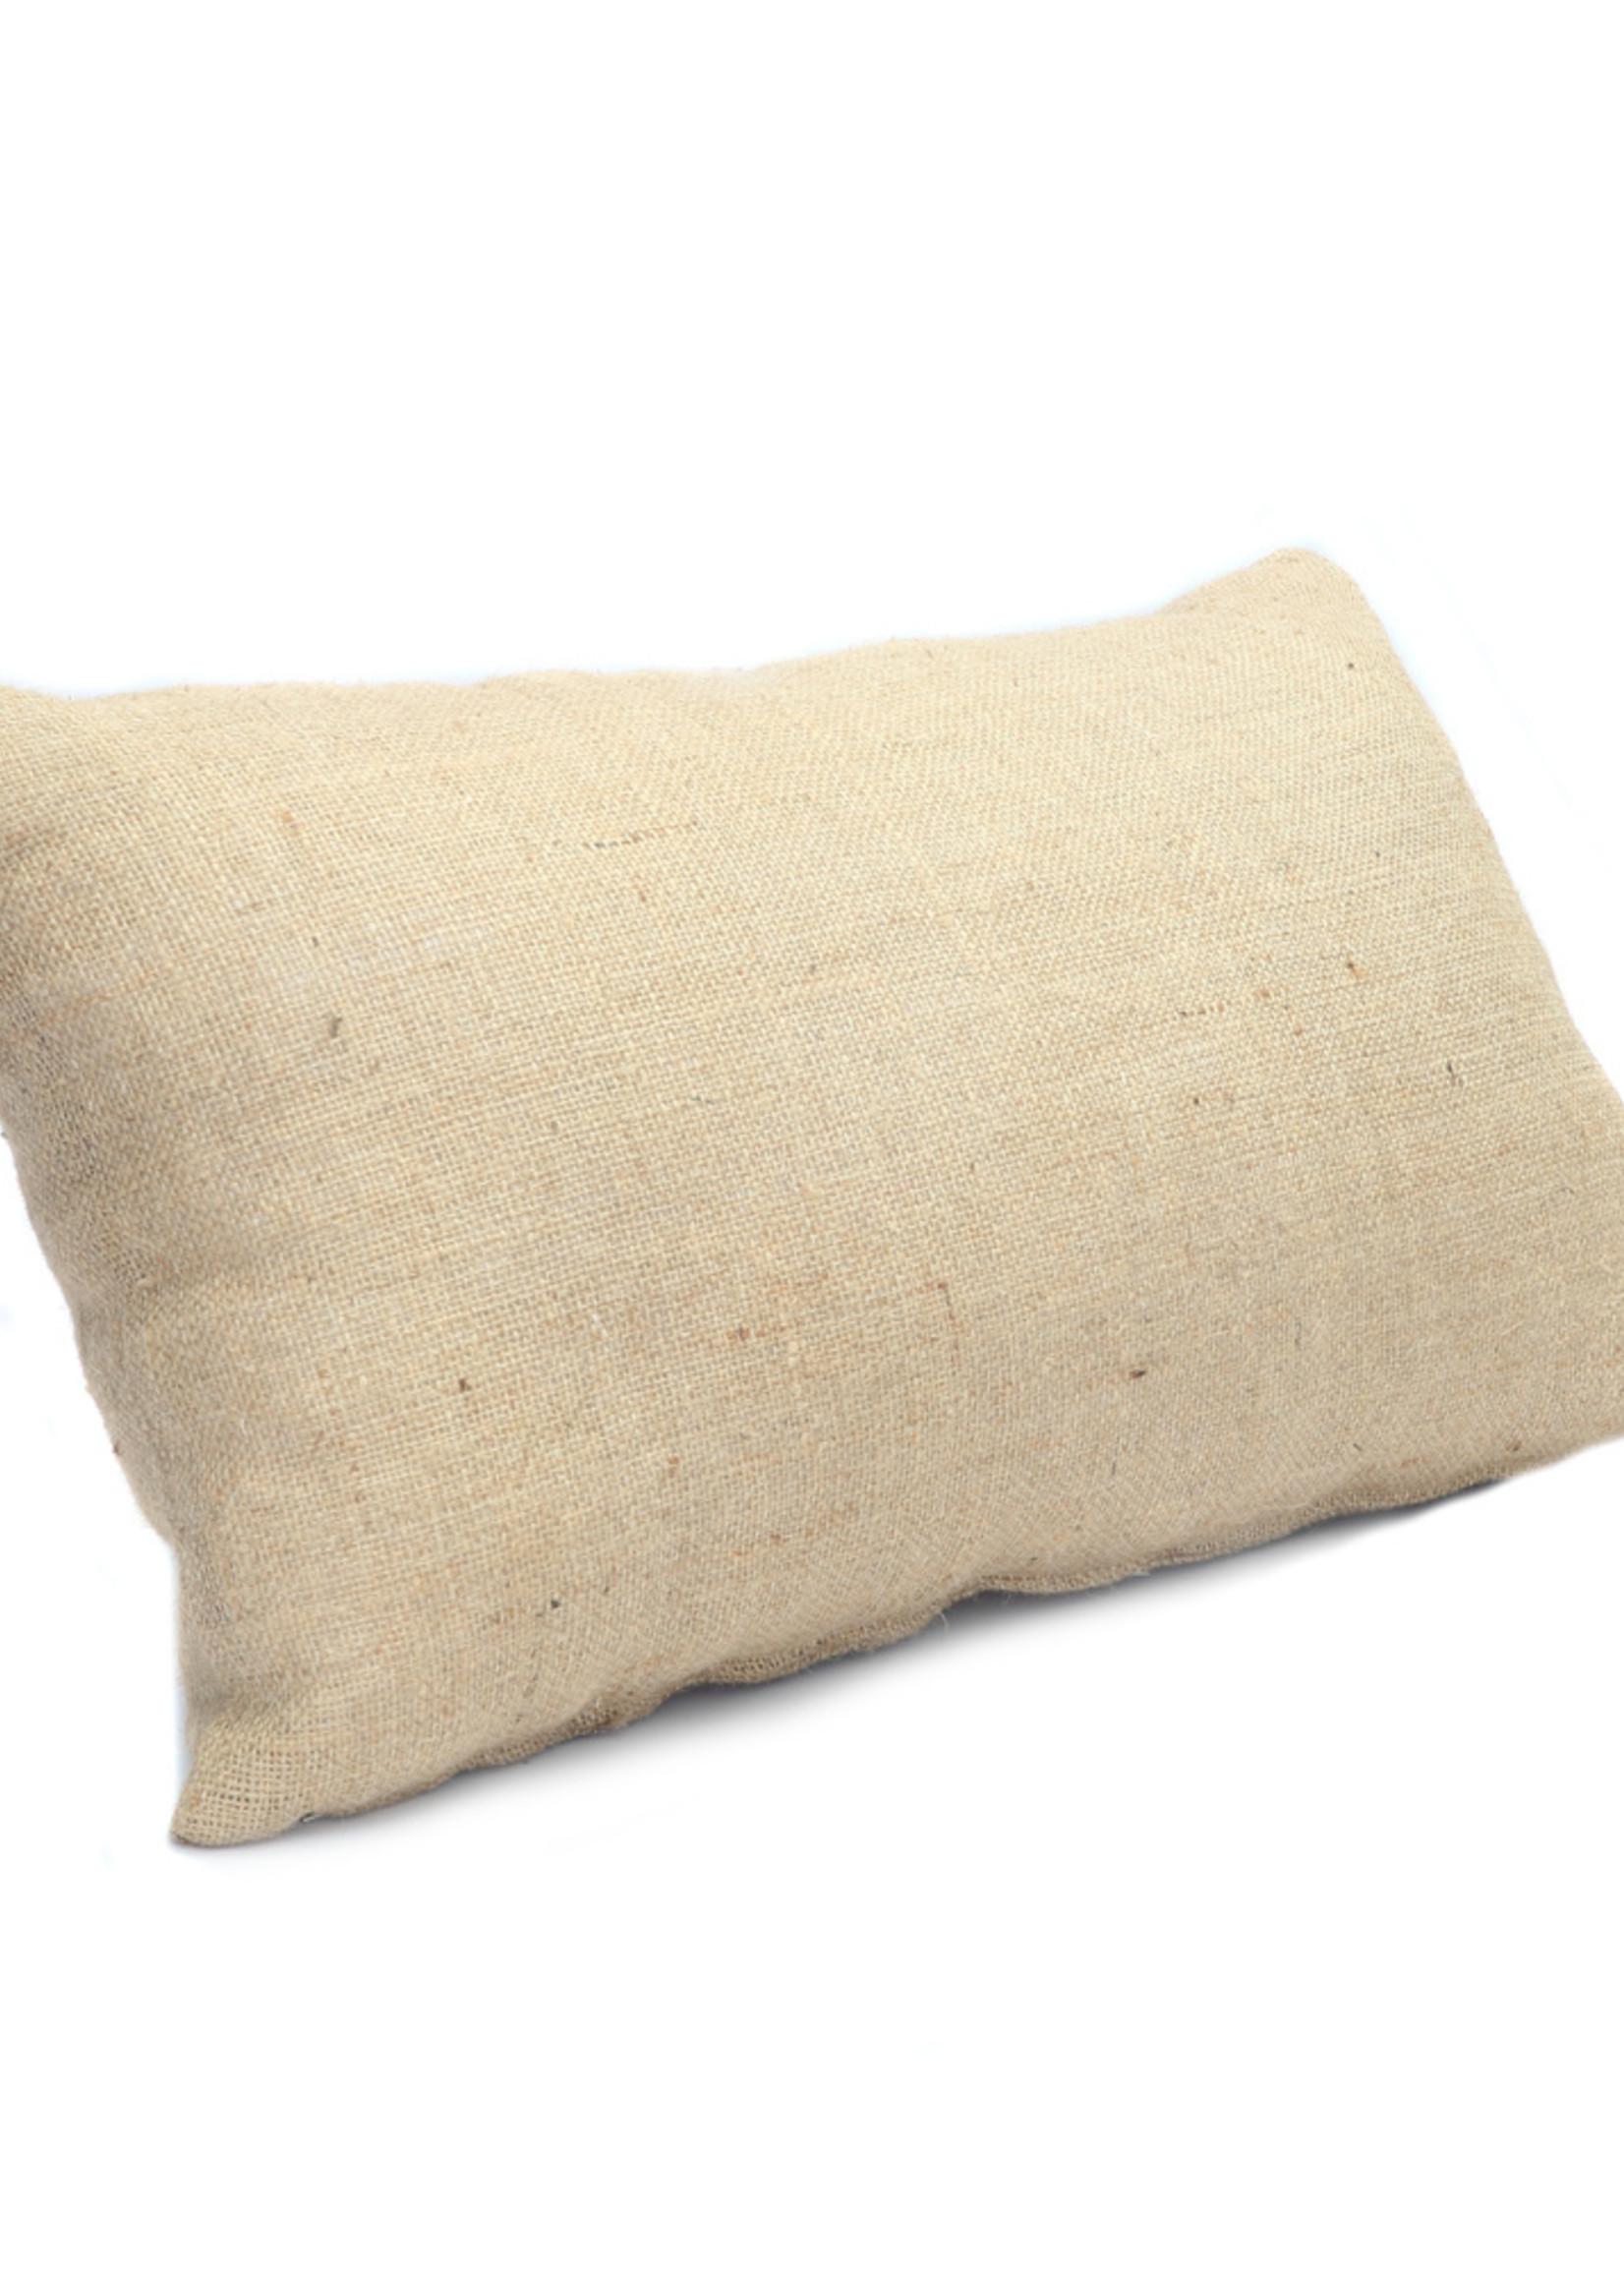 The Jute Cushion - Natural